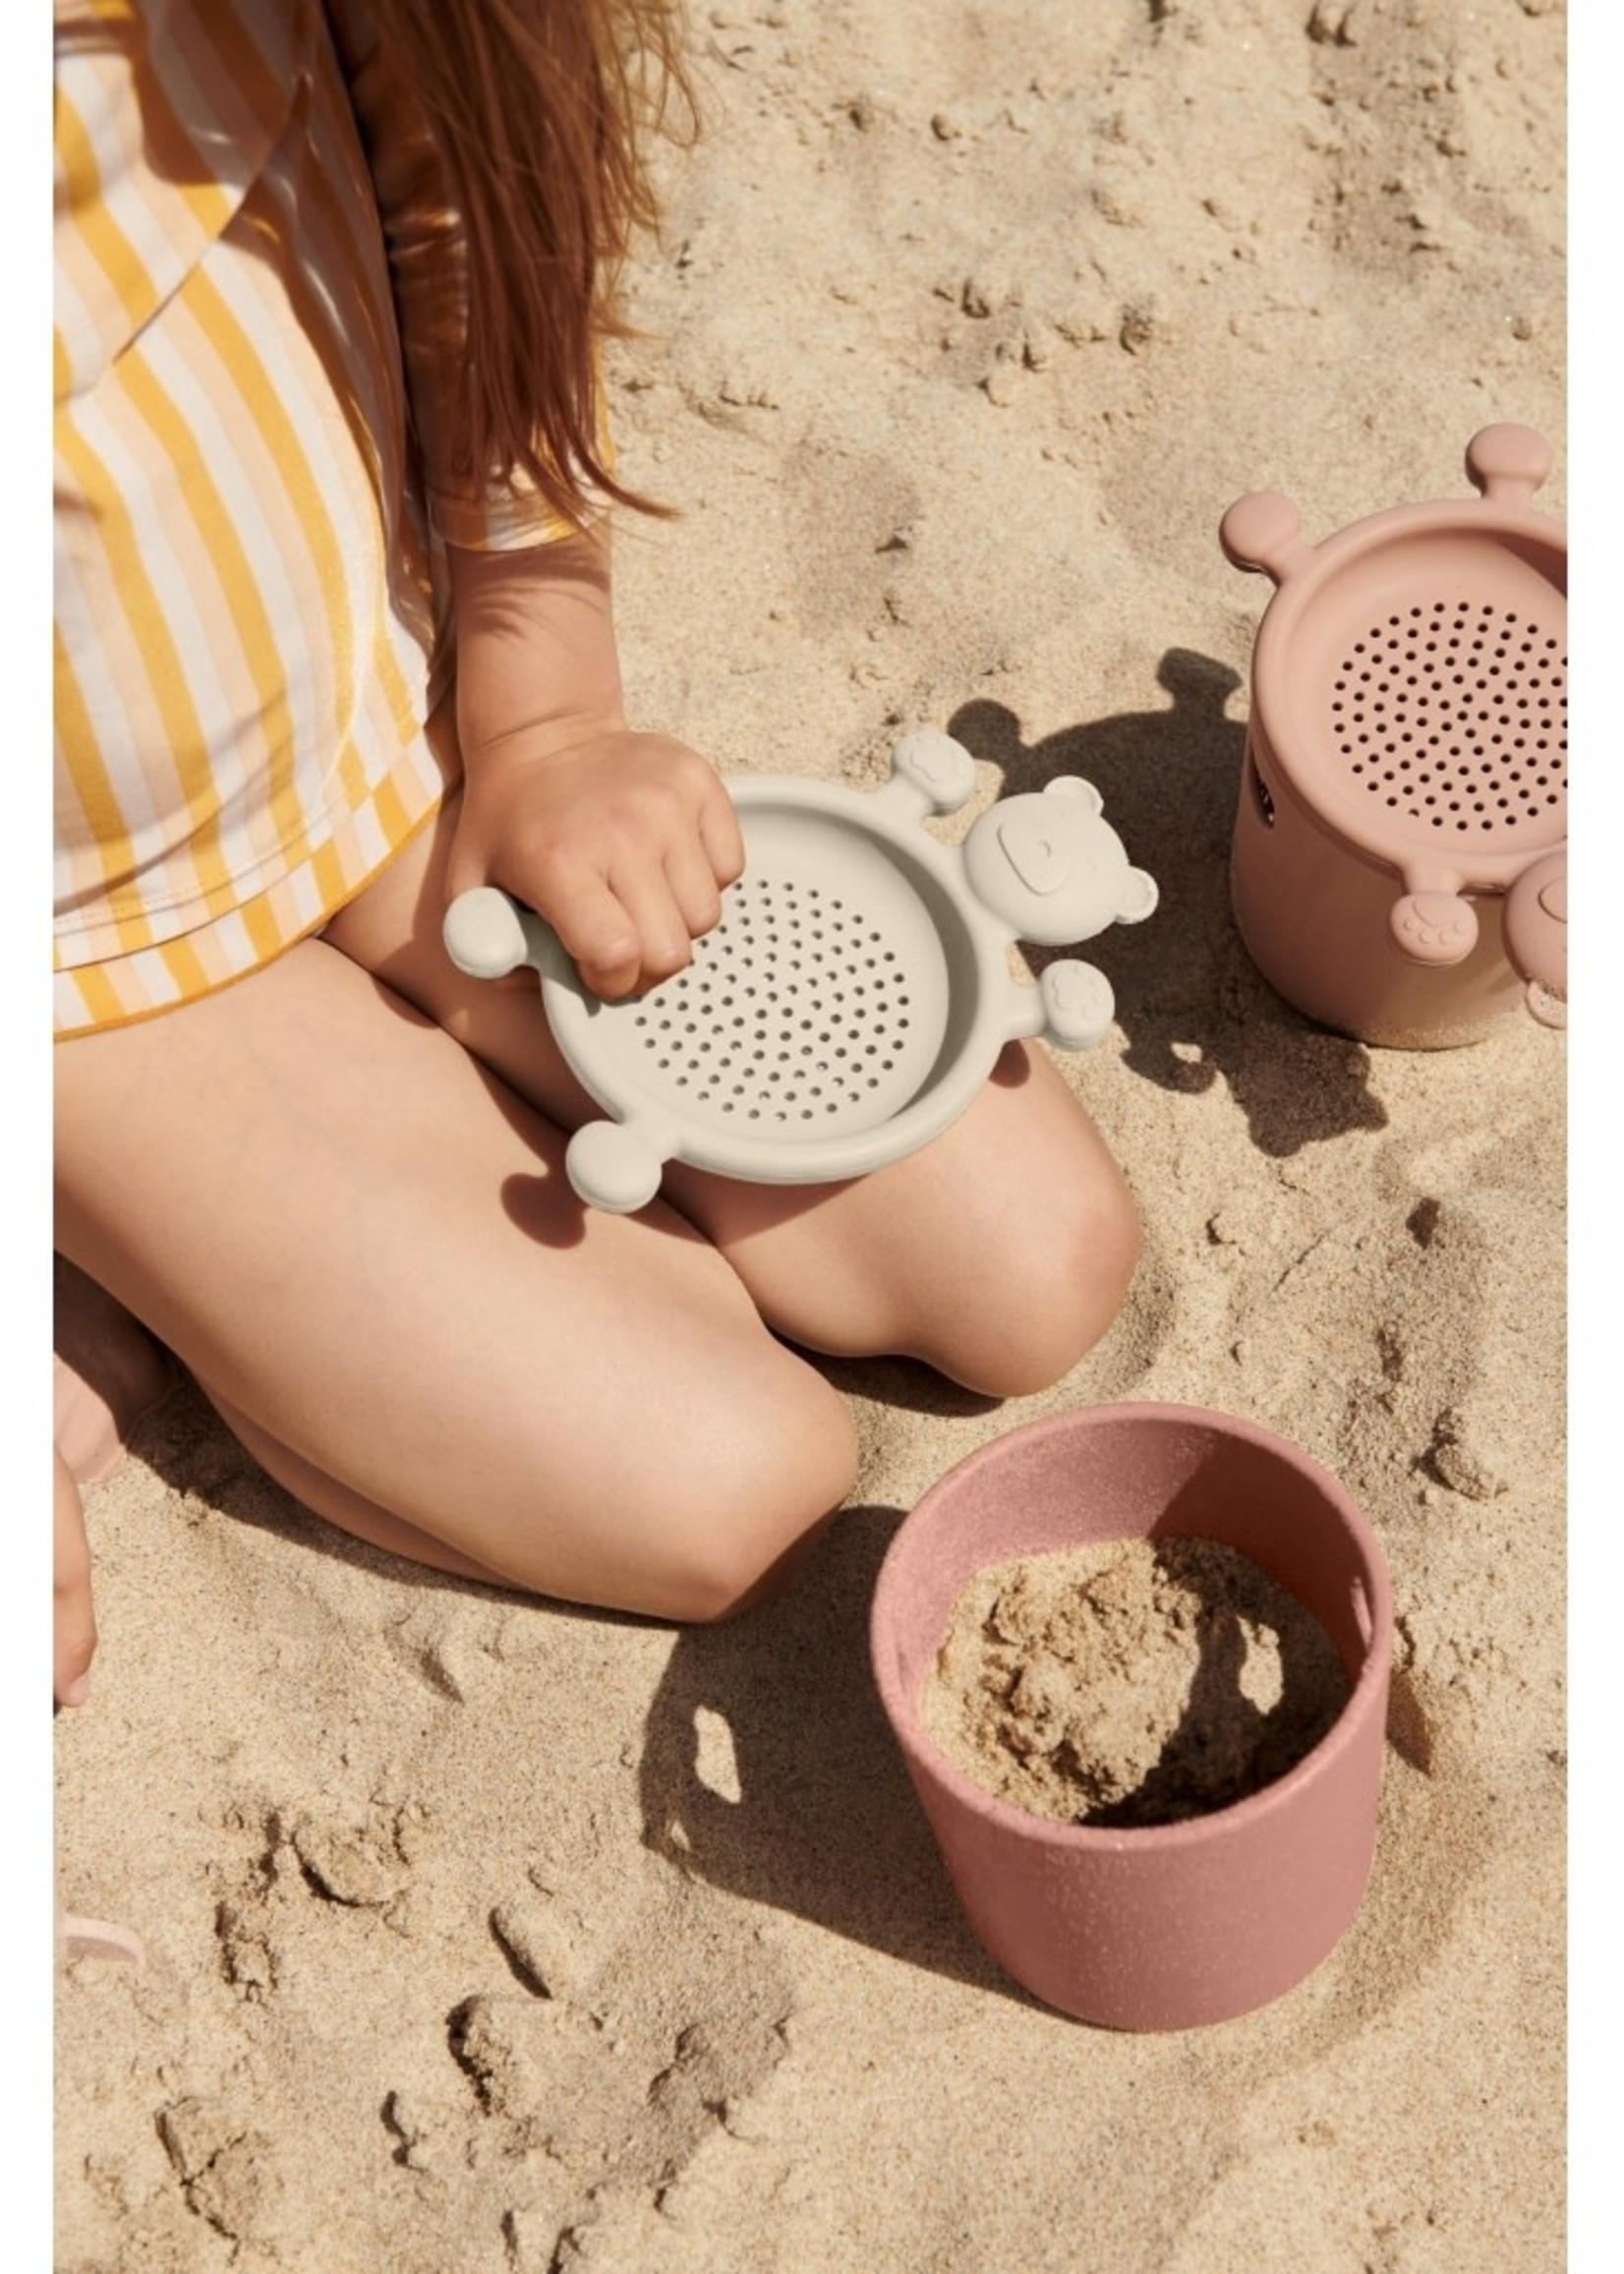 liewood Liewood-AW LW13097 Florence beach & garden set 100% silicone